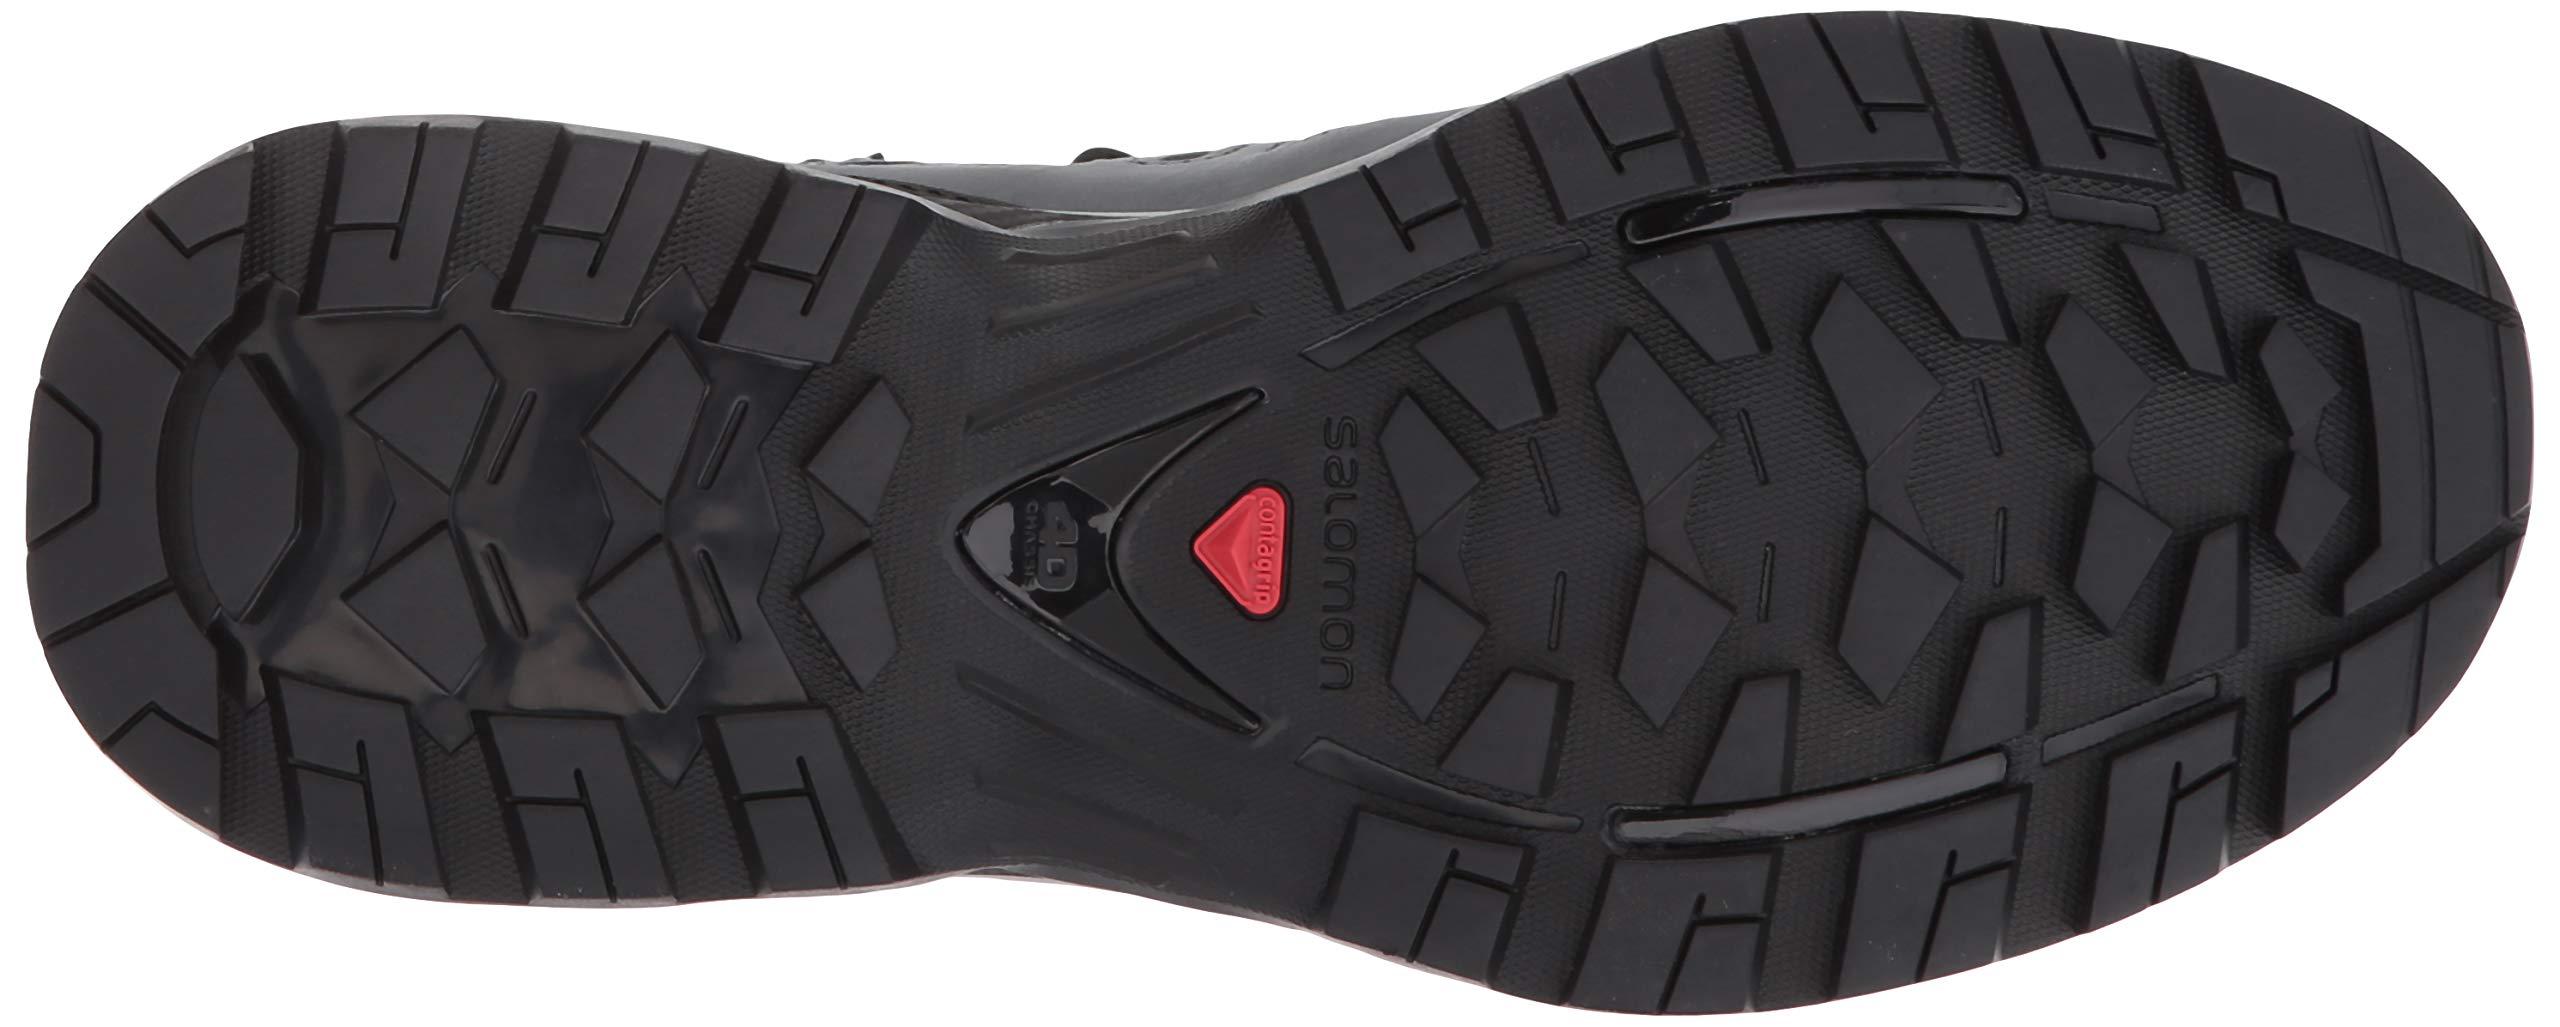 SALOMON Women's Quest 4d 3 GTX W High Rise Hiking Boots 3